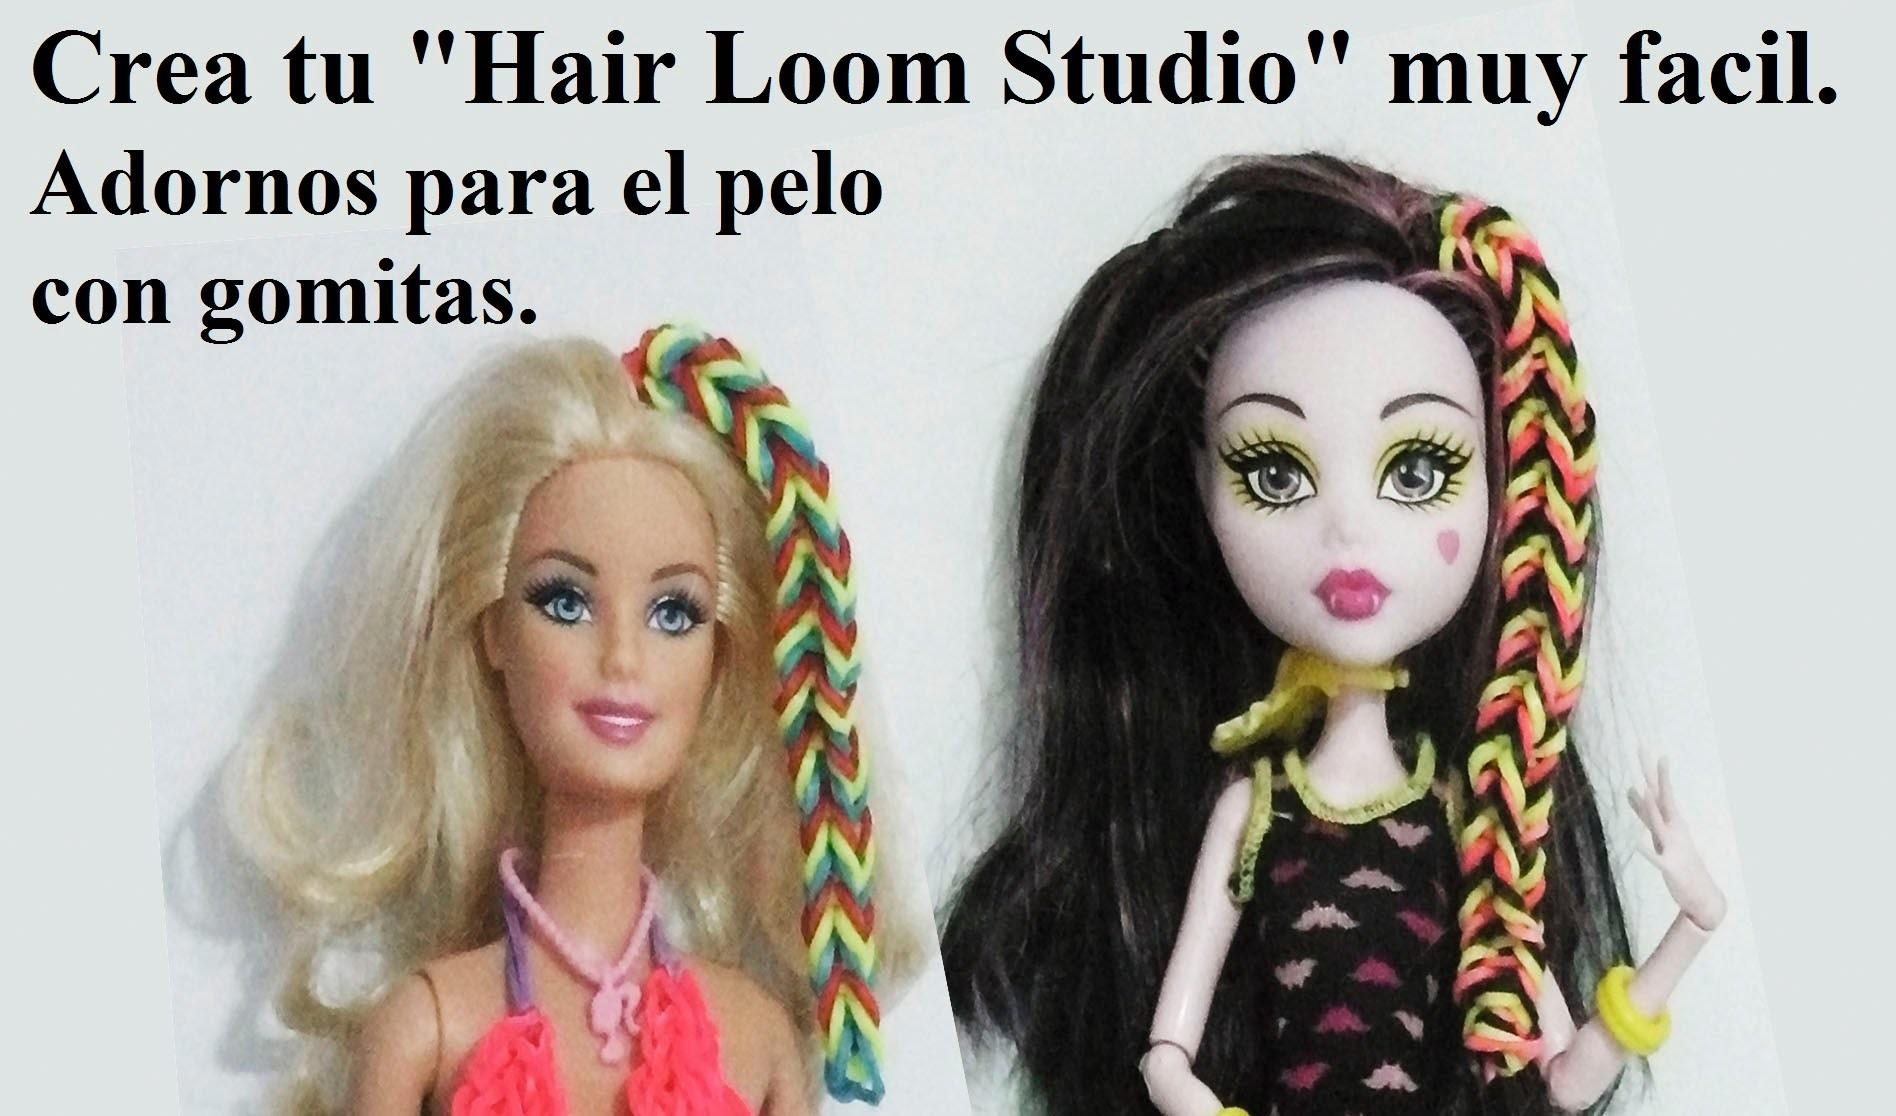 Como hacer un adorno para el pelo de gomita con trenza fishtail para muñecas Barbie o monster high